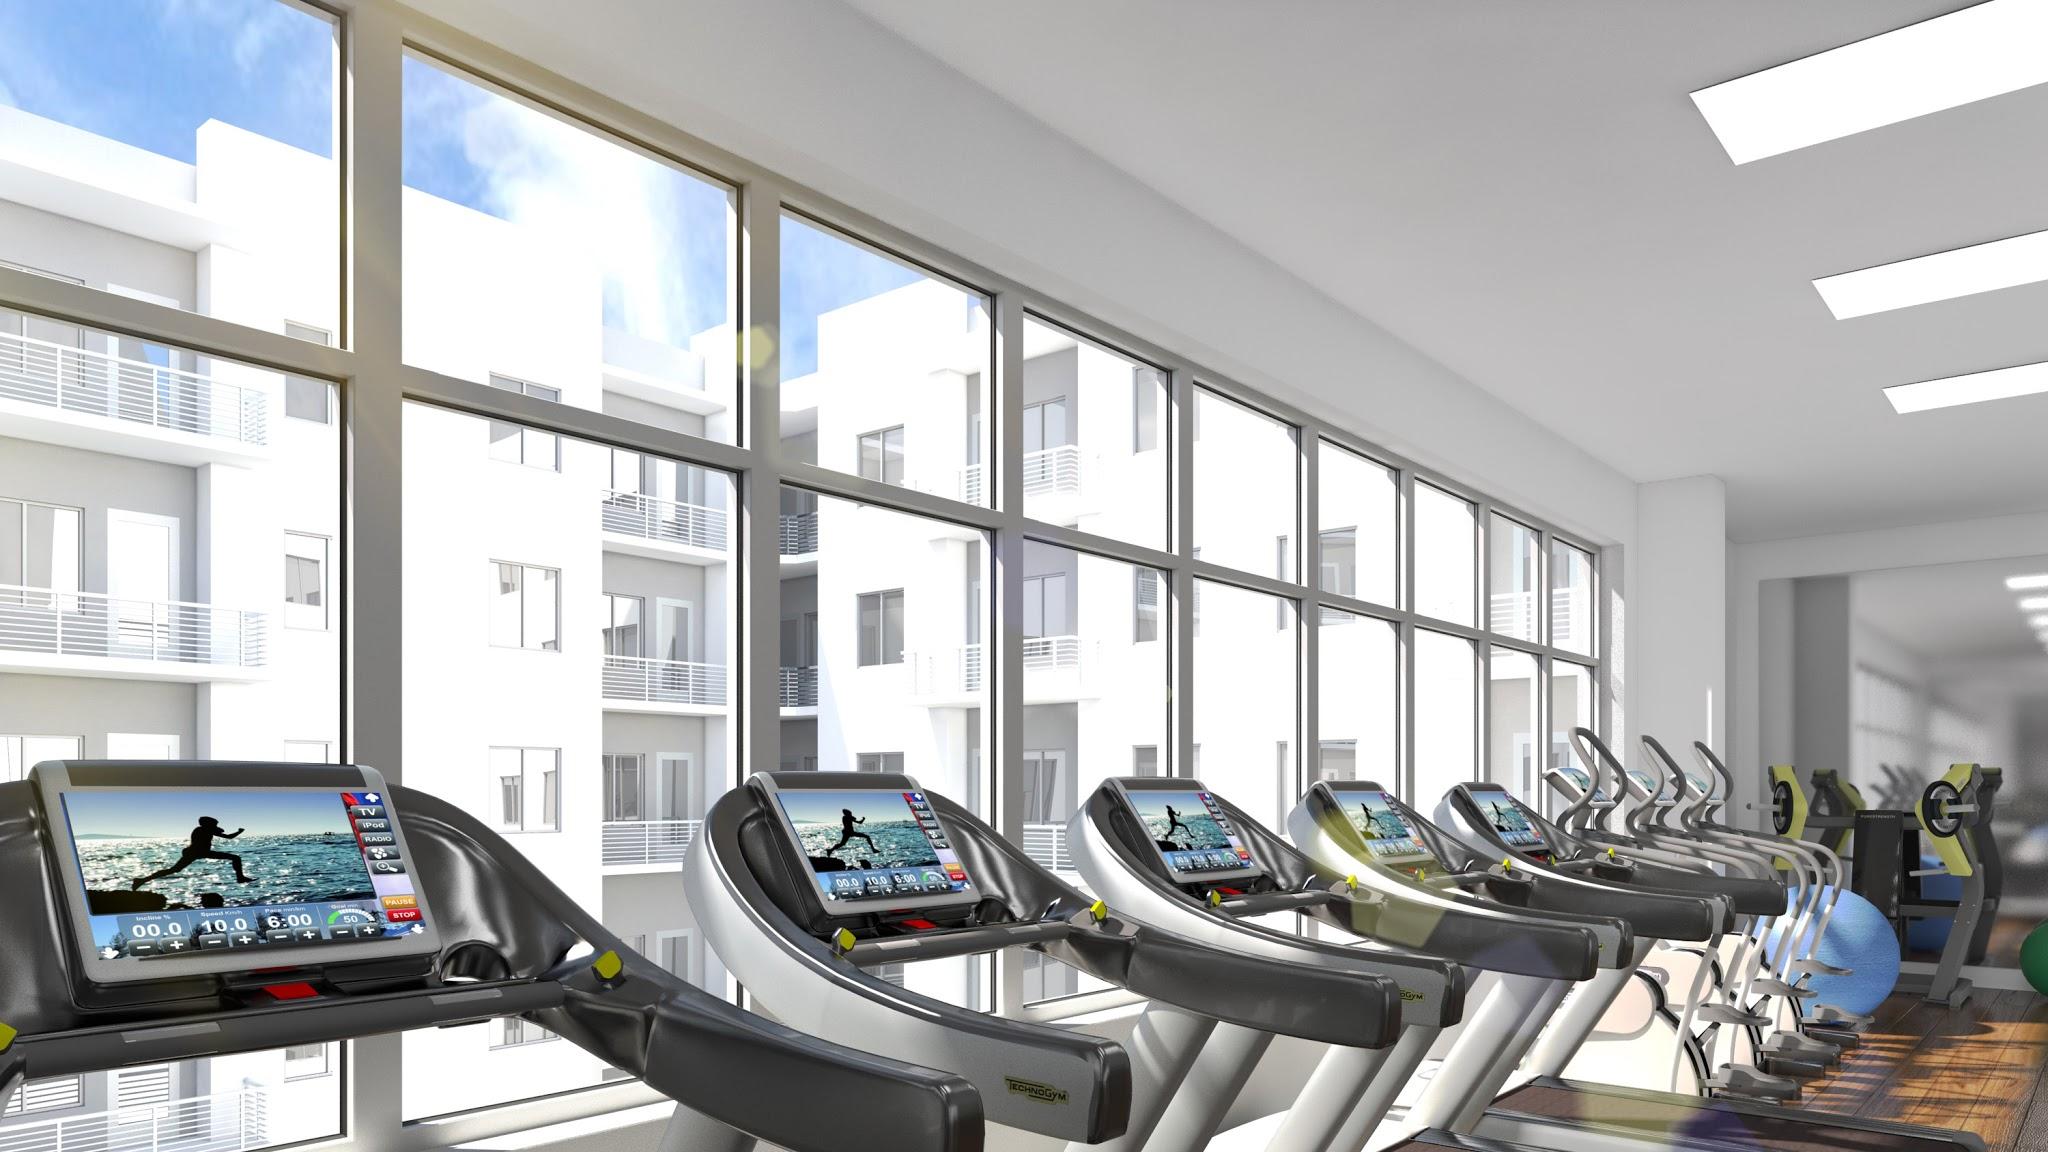 Aloft Workout Facility